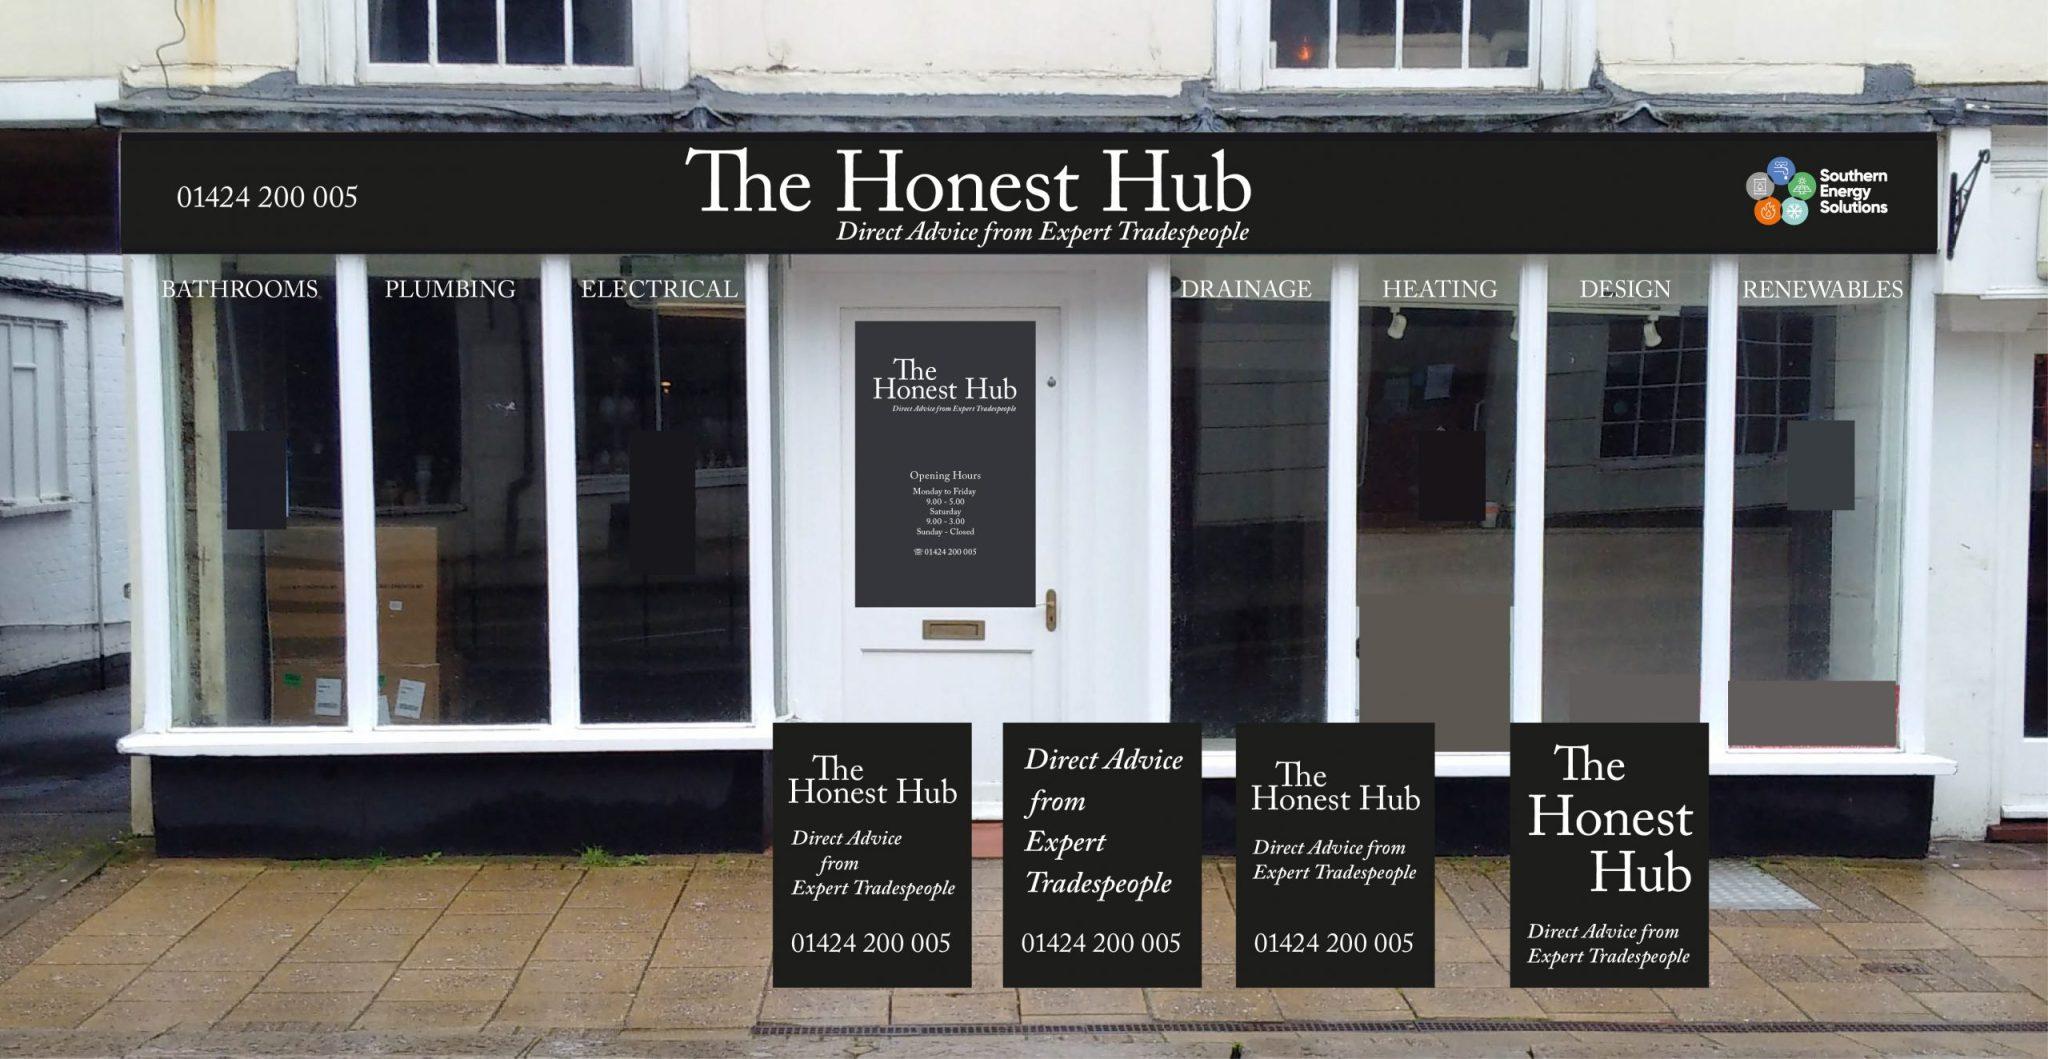 Honest Hub image